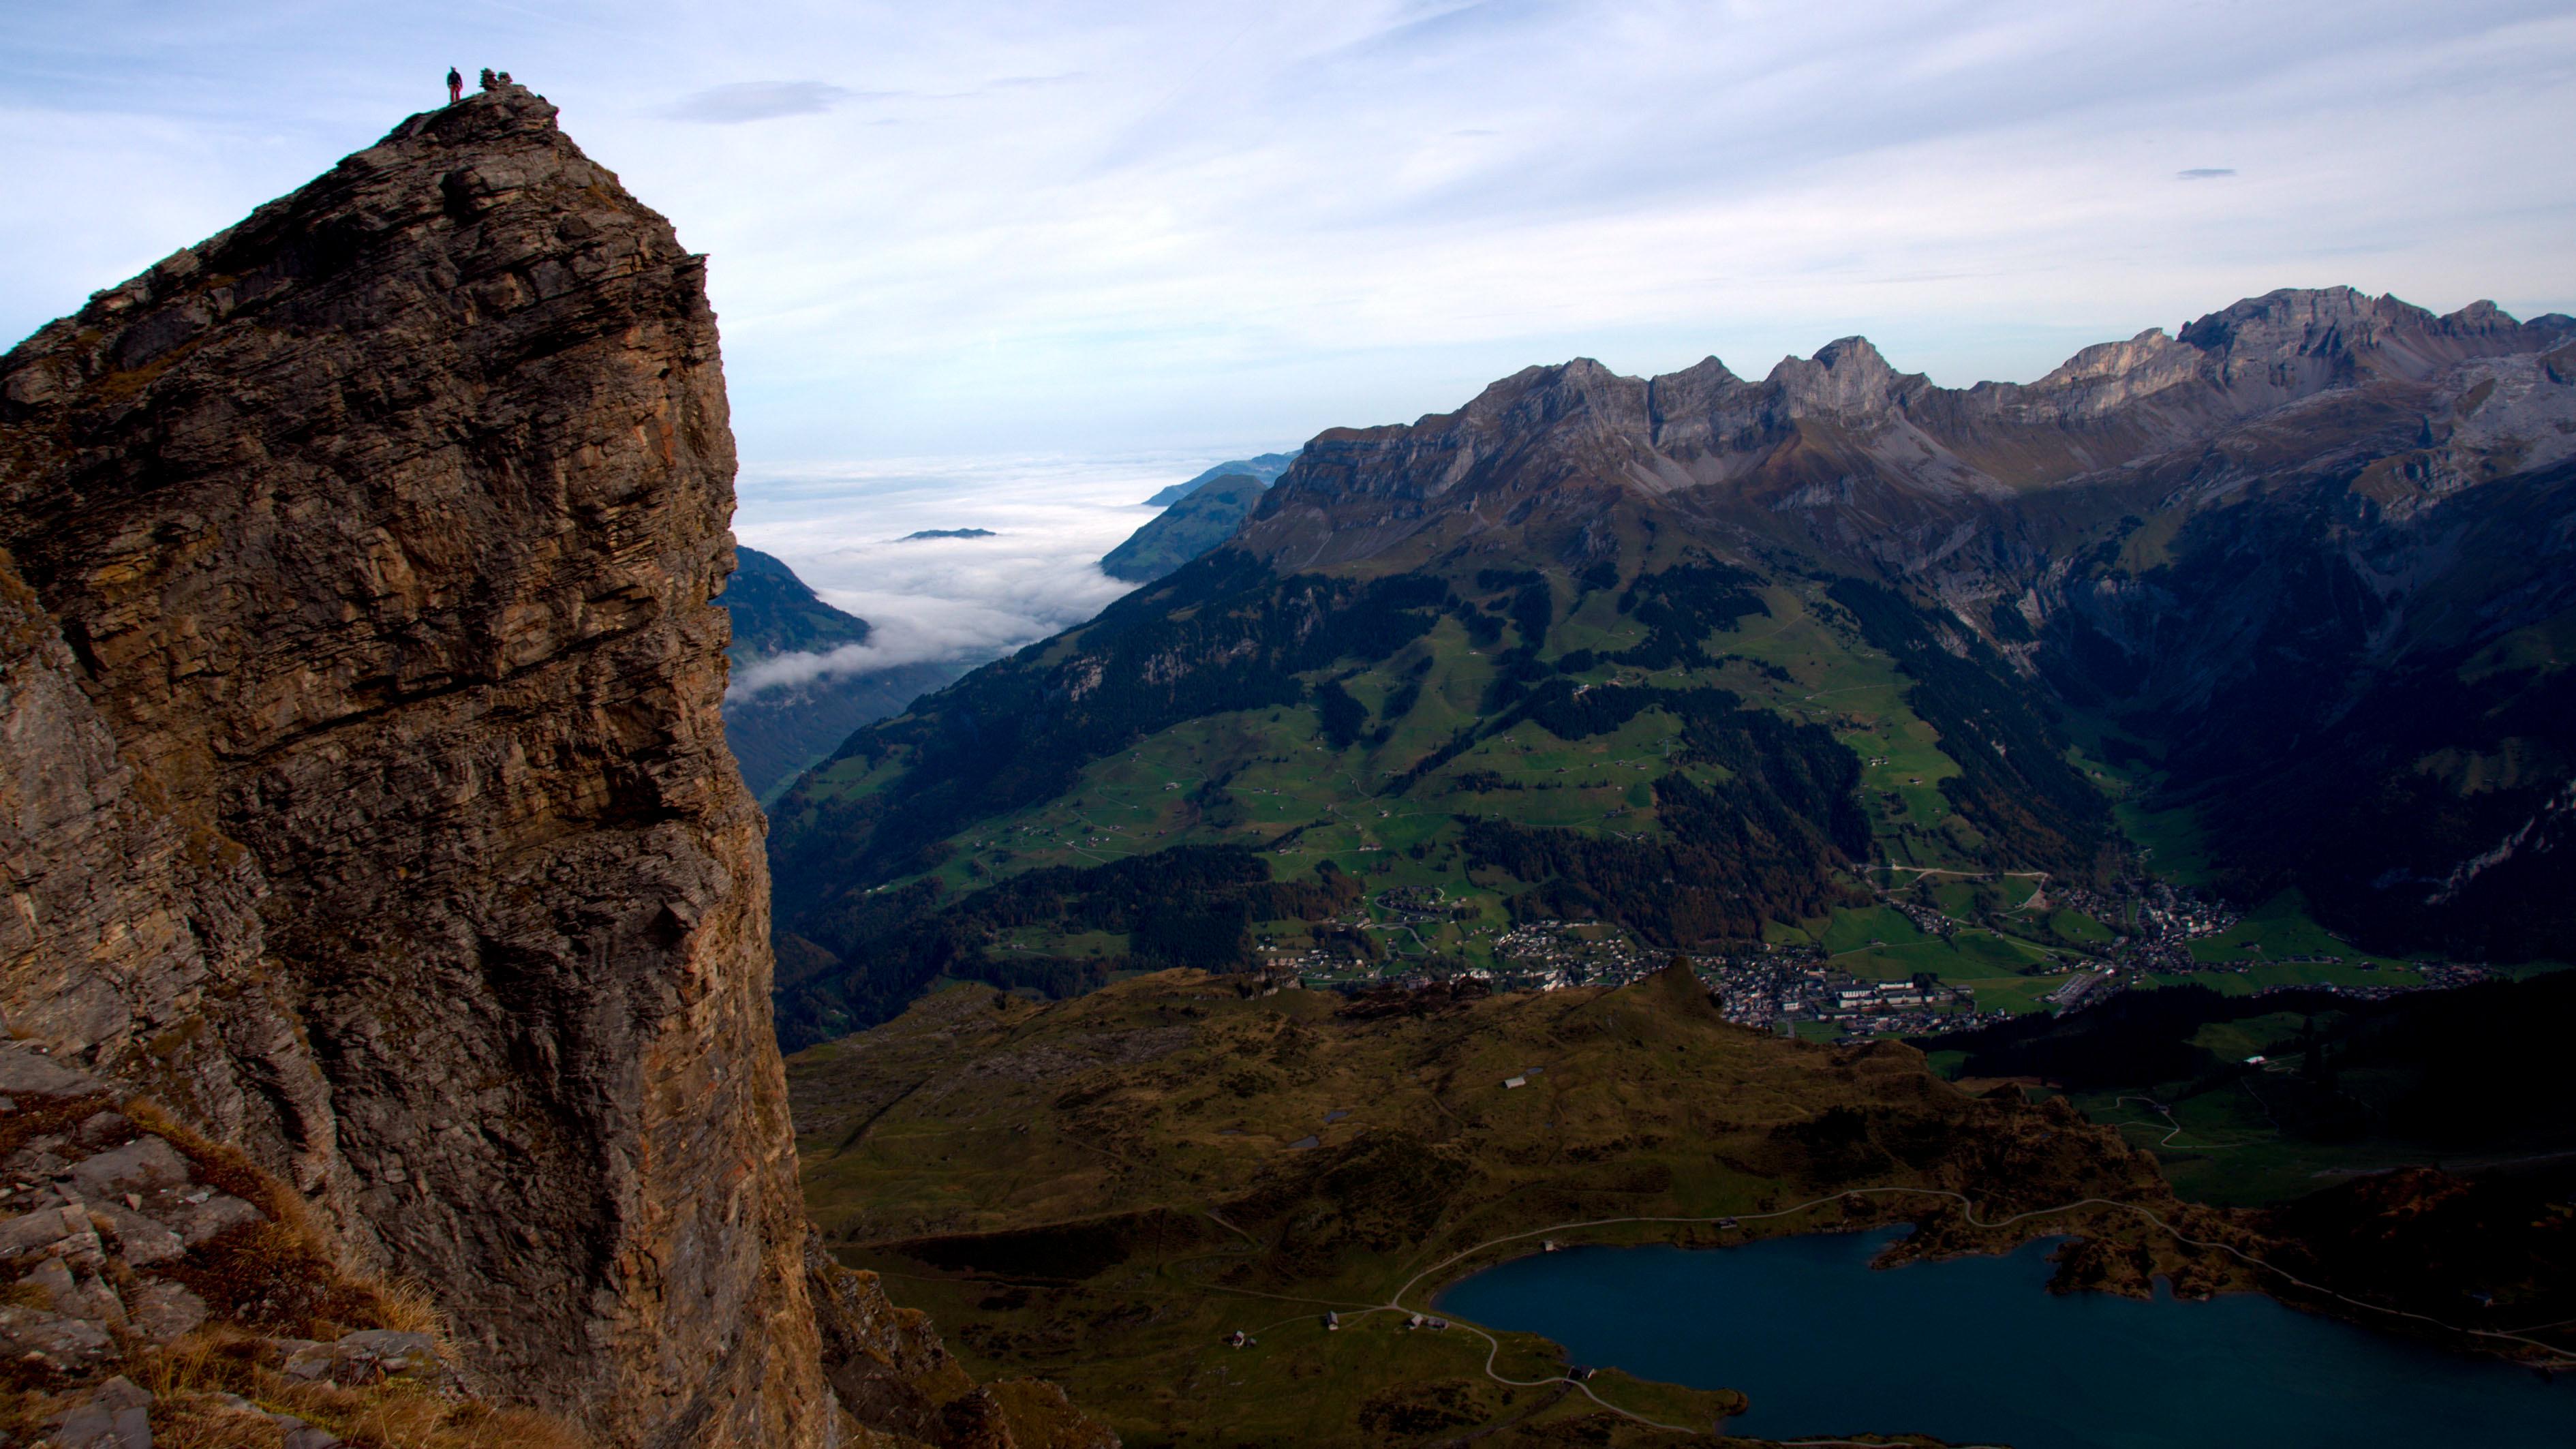 Klettersteig Jochpass : Graustock u2013 engelberg mountain guide